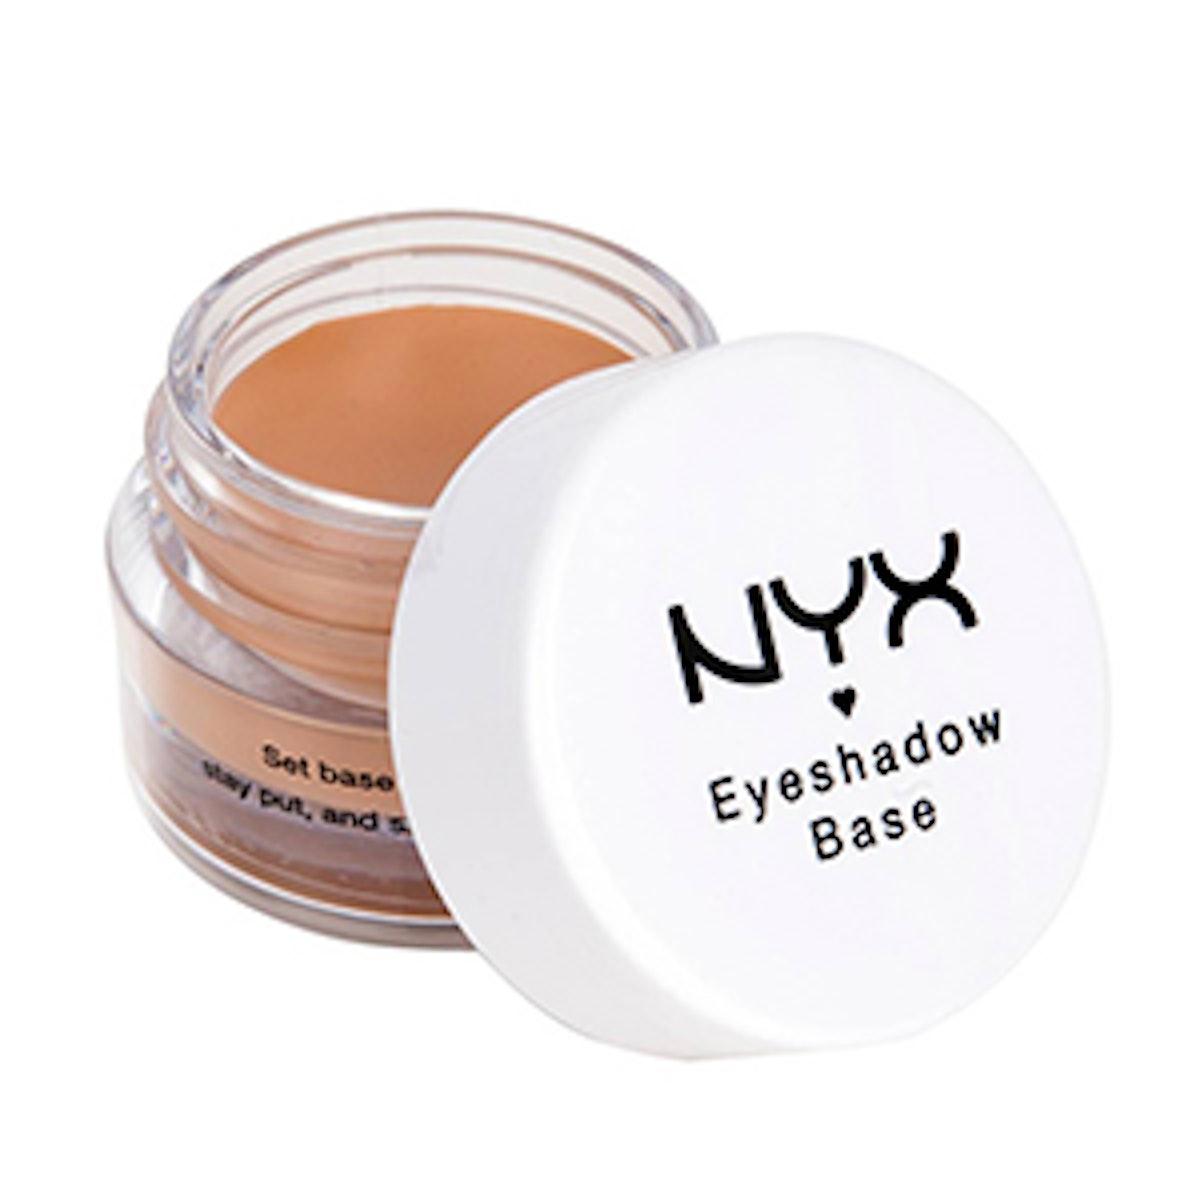 NYX Eye Shadow Base in Skin Tone